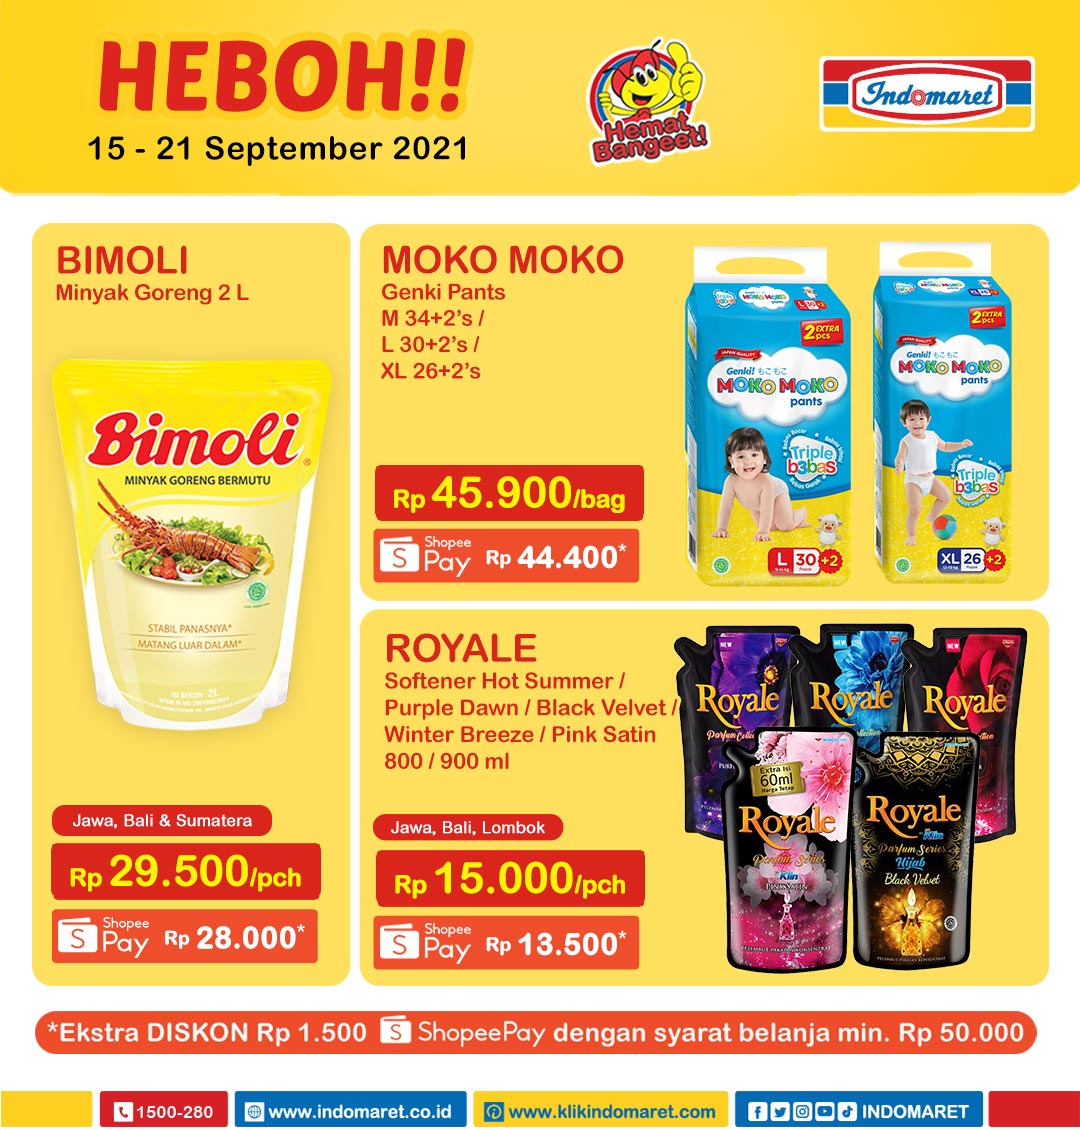 Promo INDOMARET Heboh, Product of The Week 15 - 21 September 2021